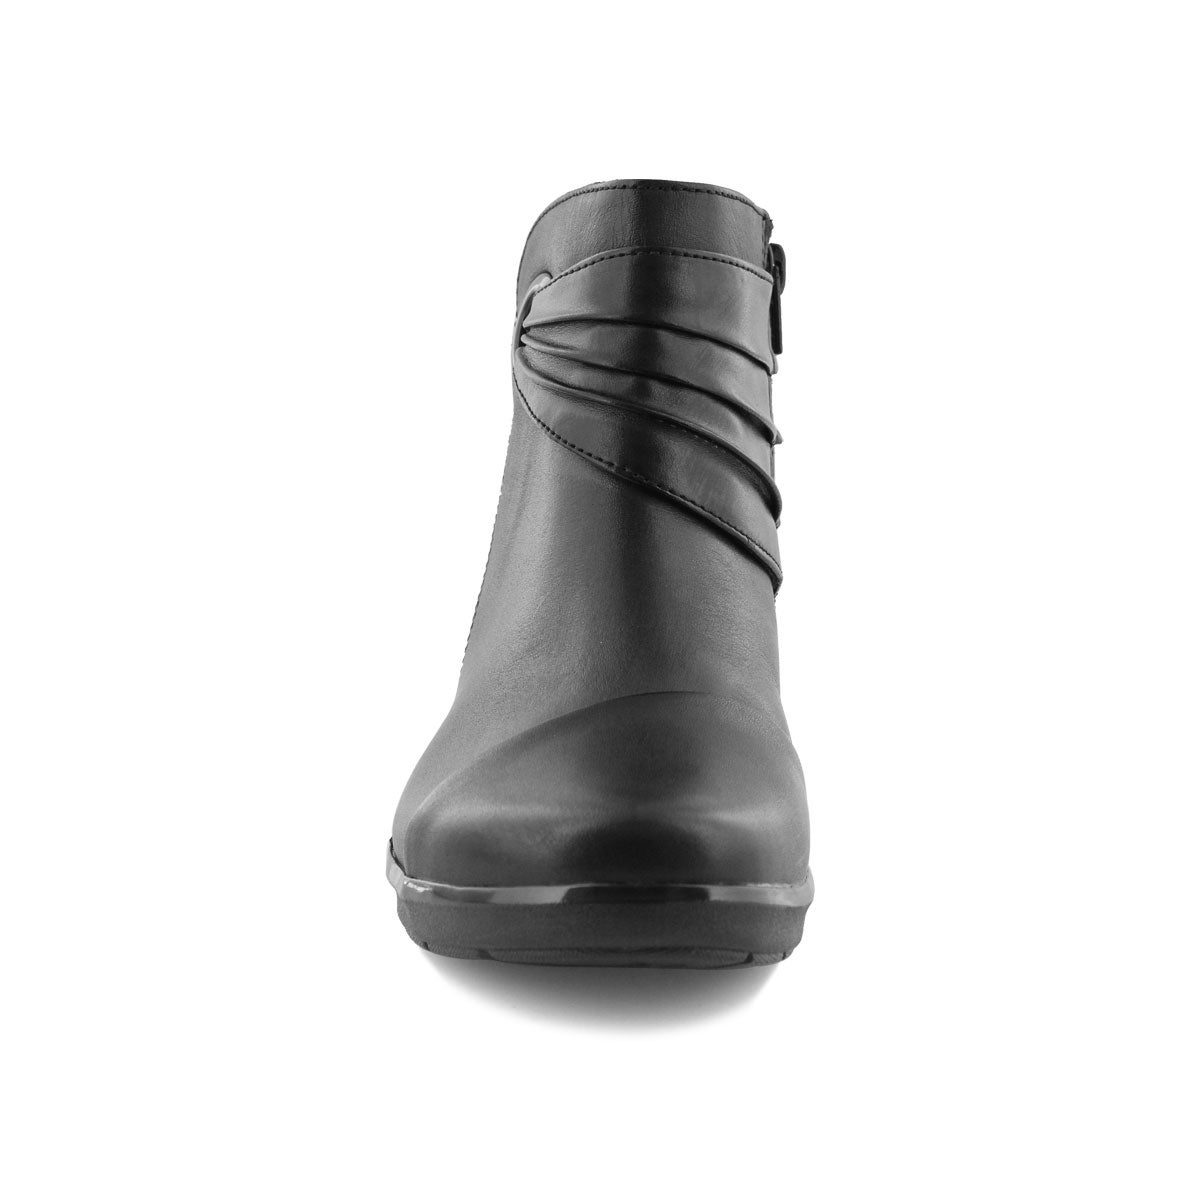 Women's Hope Twirl Ankle Boot - Black